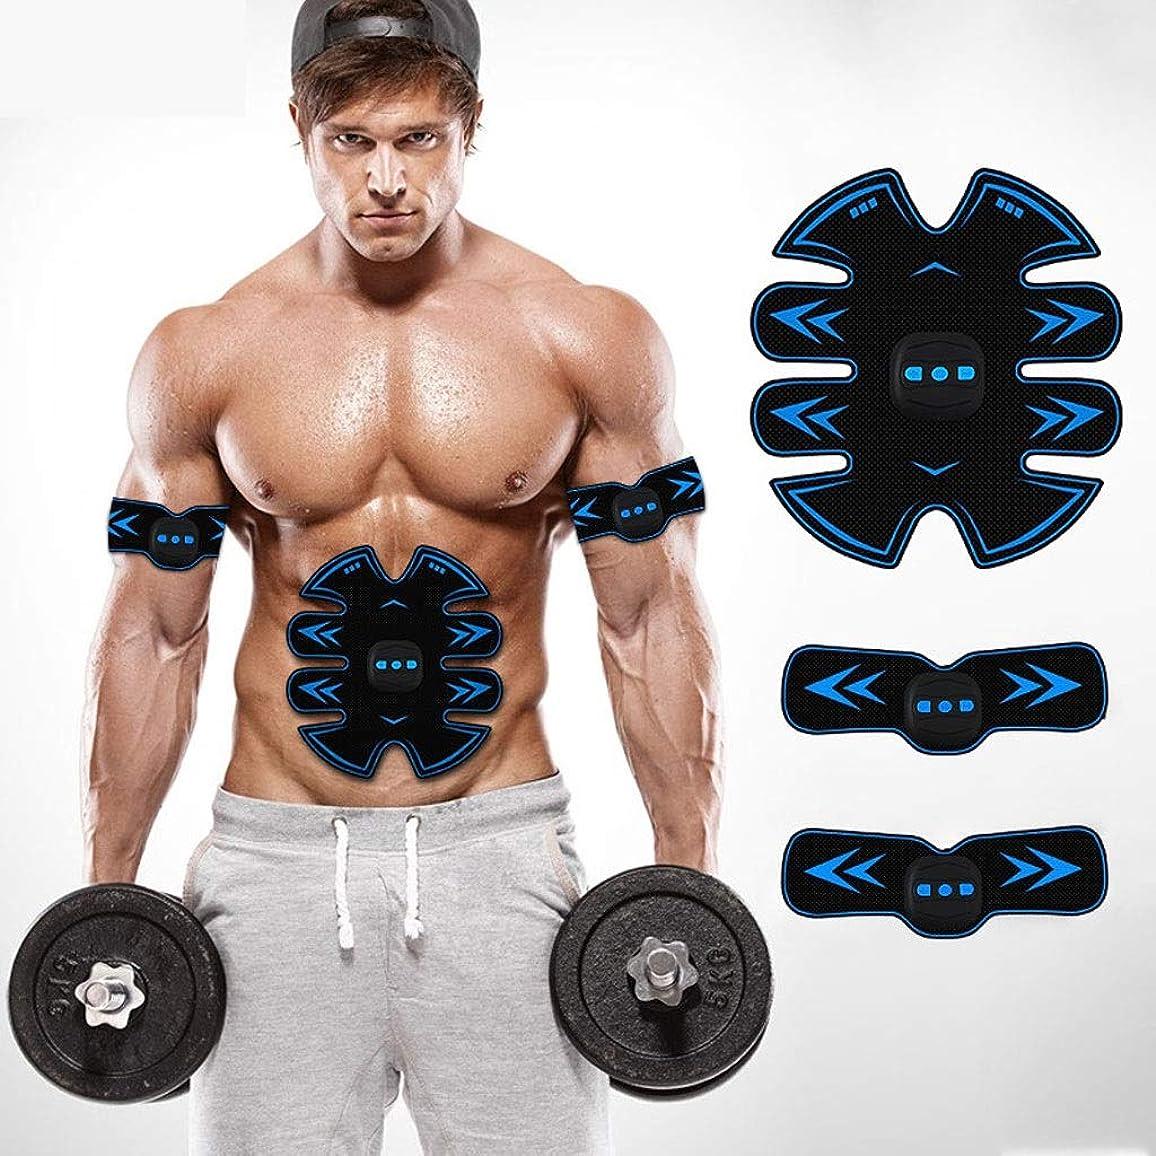 Usb充電筋肉トナーabs abシミュレータ腹部調色ベルトワークアウトワイヤレスEMSトレーニングホームオフィス用腹部腕脚トレーニングホームオフィス (Color : Blue)